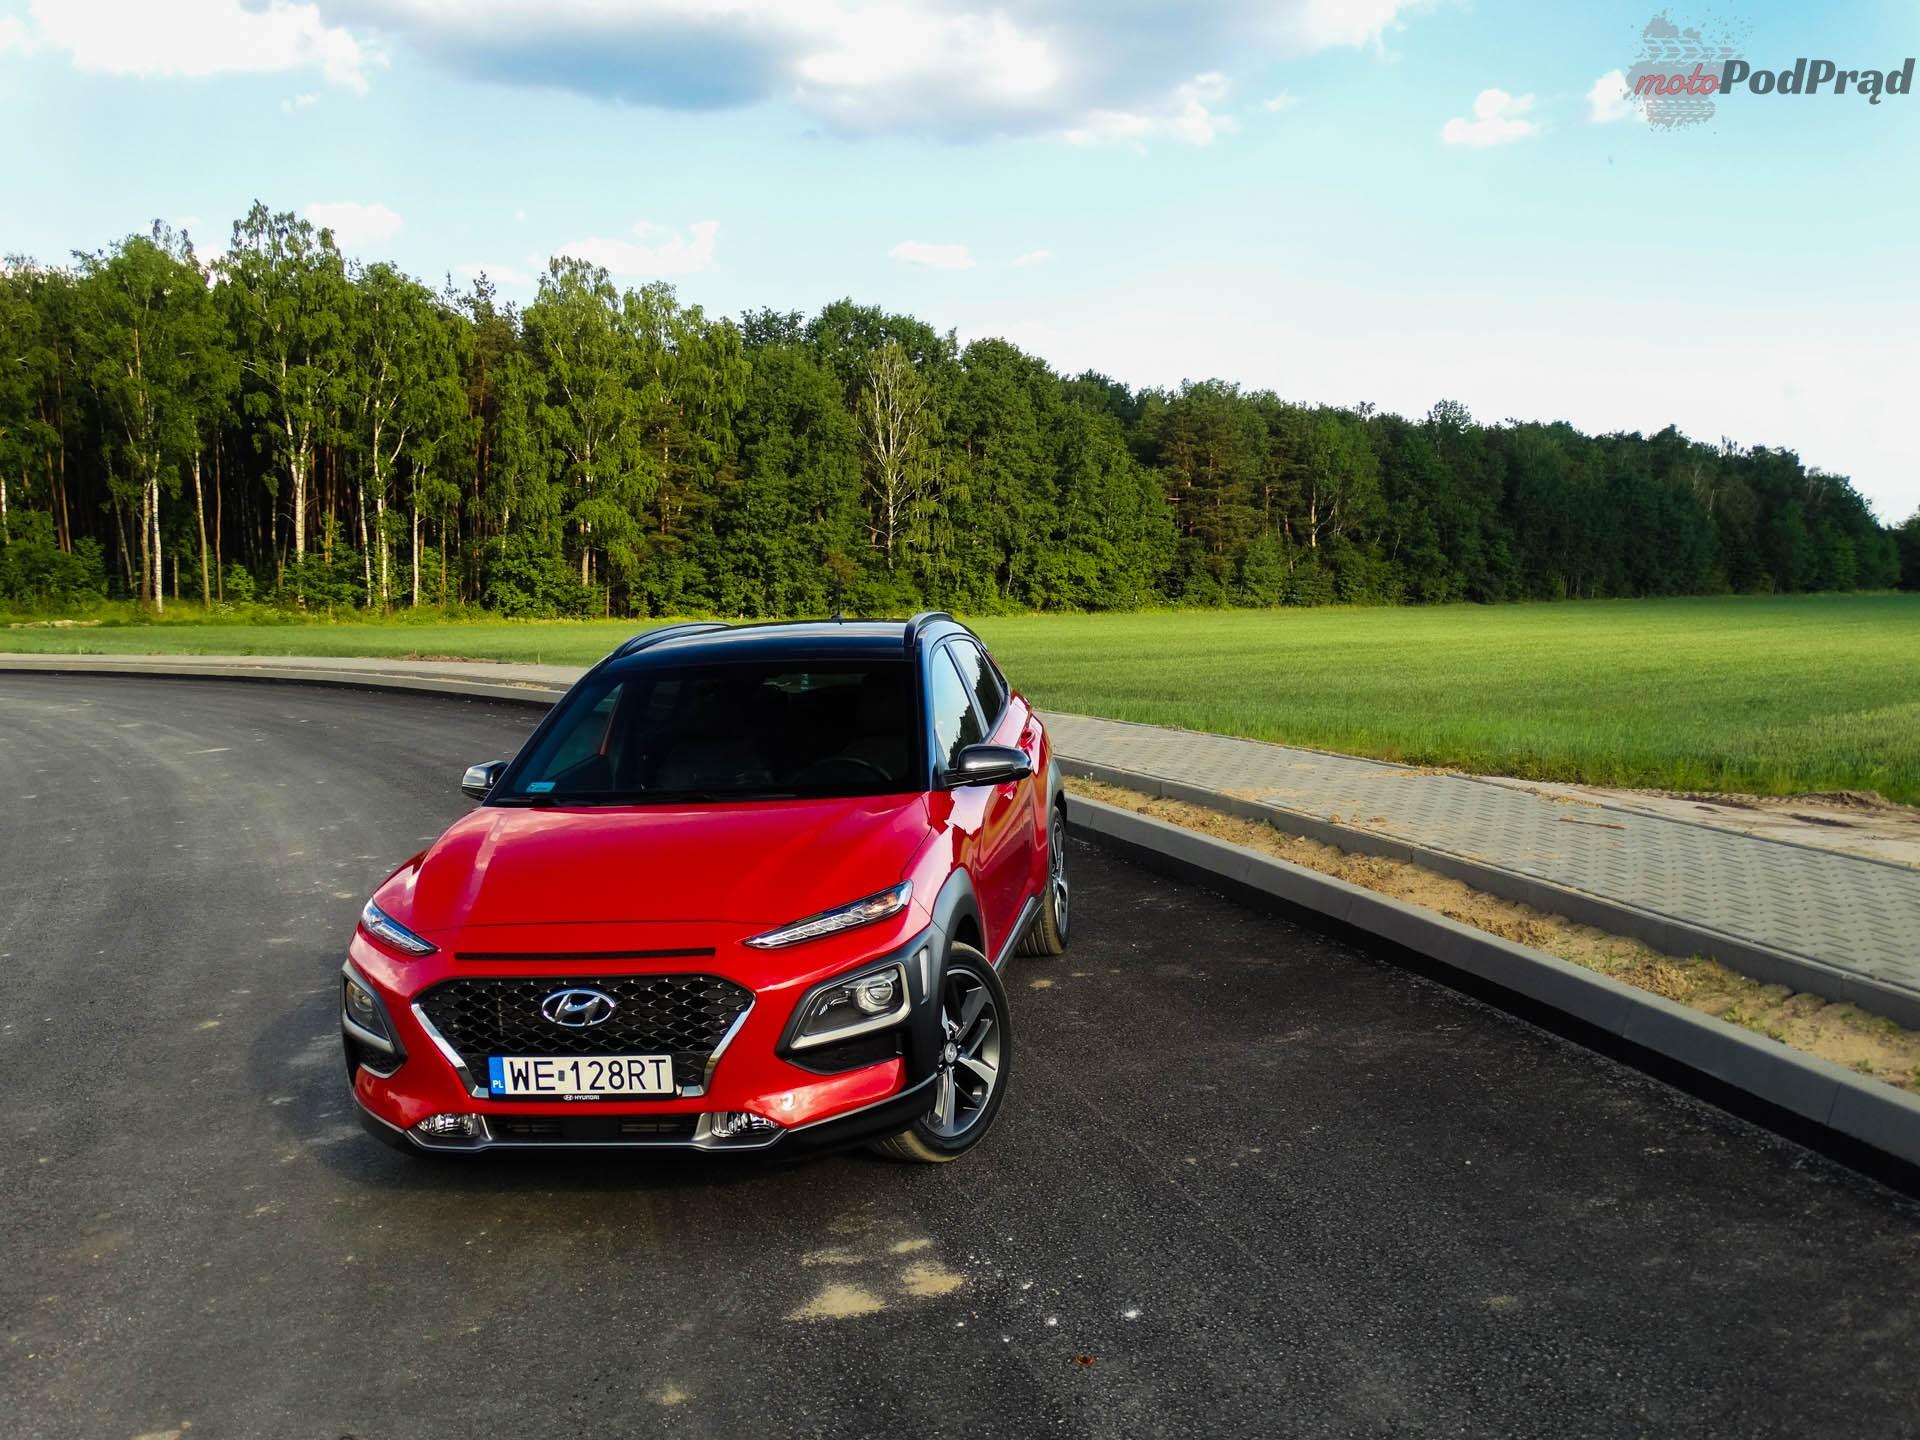 Hyundai Kona 1 Porównanie: Hyundai Kona 1.0 kontra Seat Arona 1.0